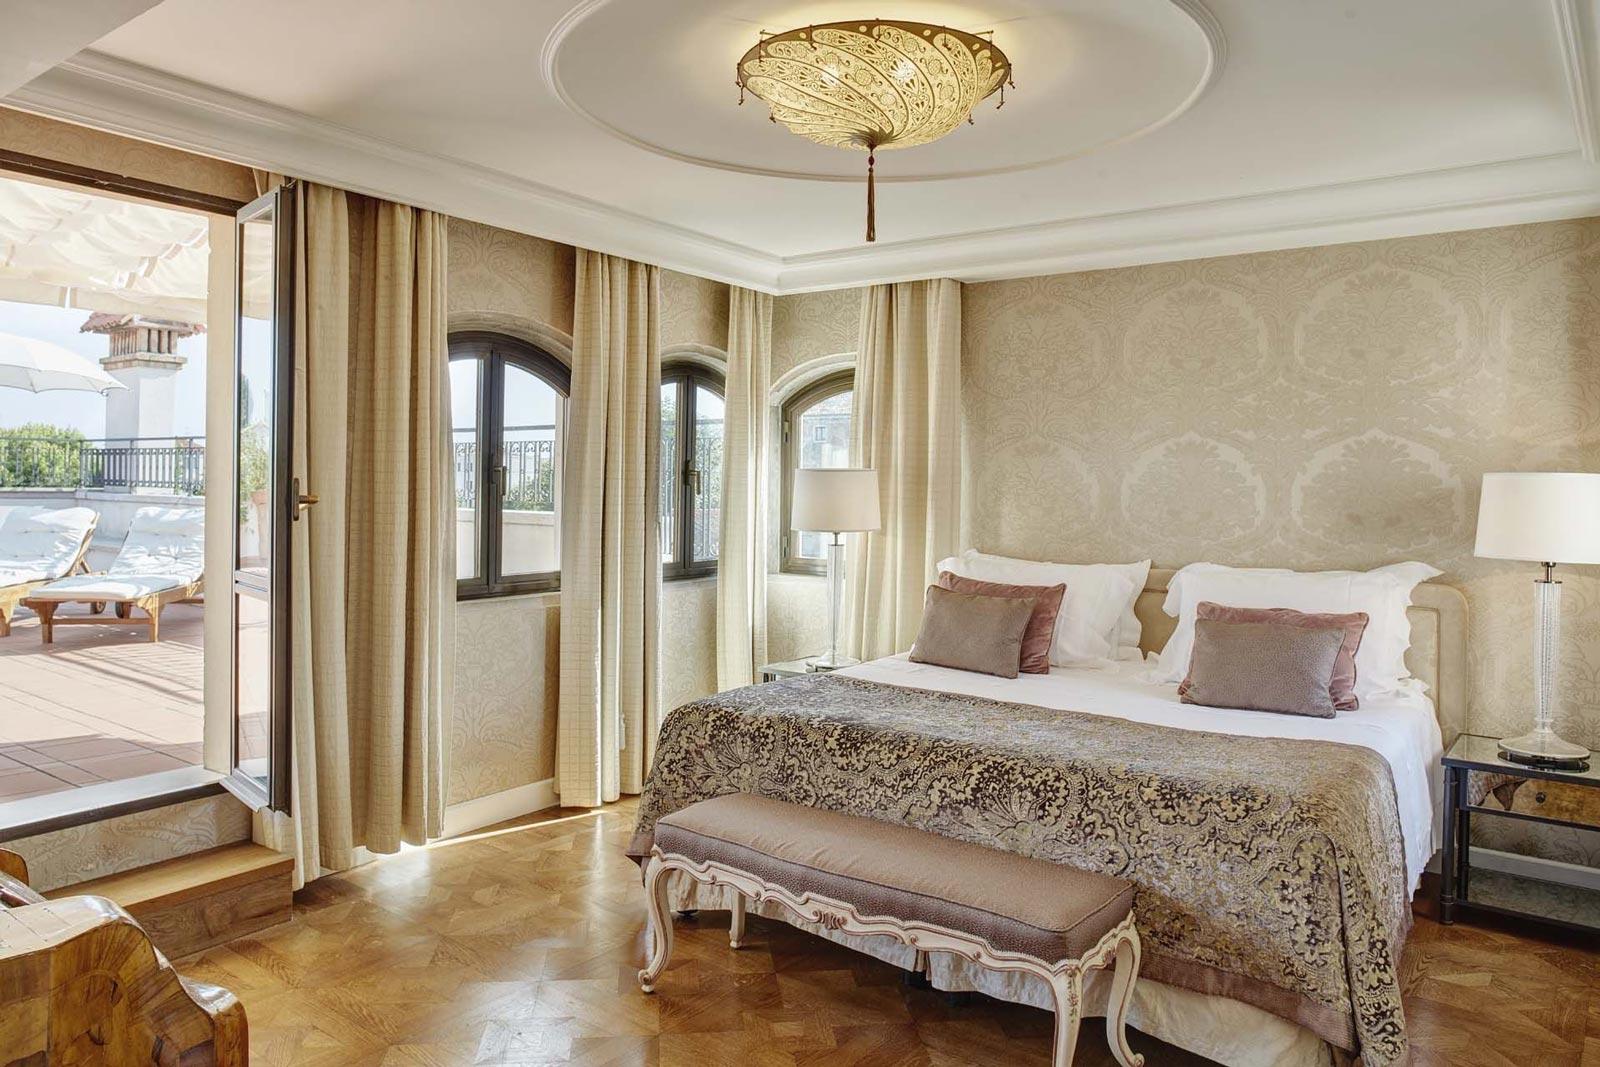 Belmond Hotel Cipriani Fortuny Saracen Shield Seidenlampe